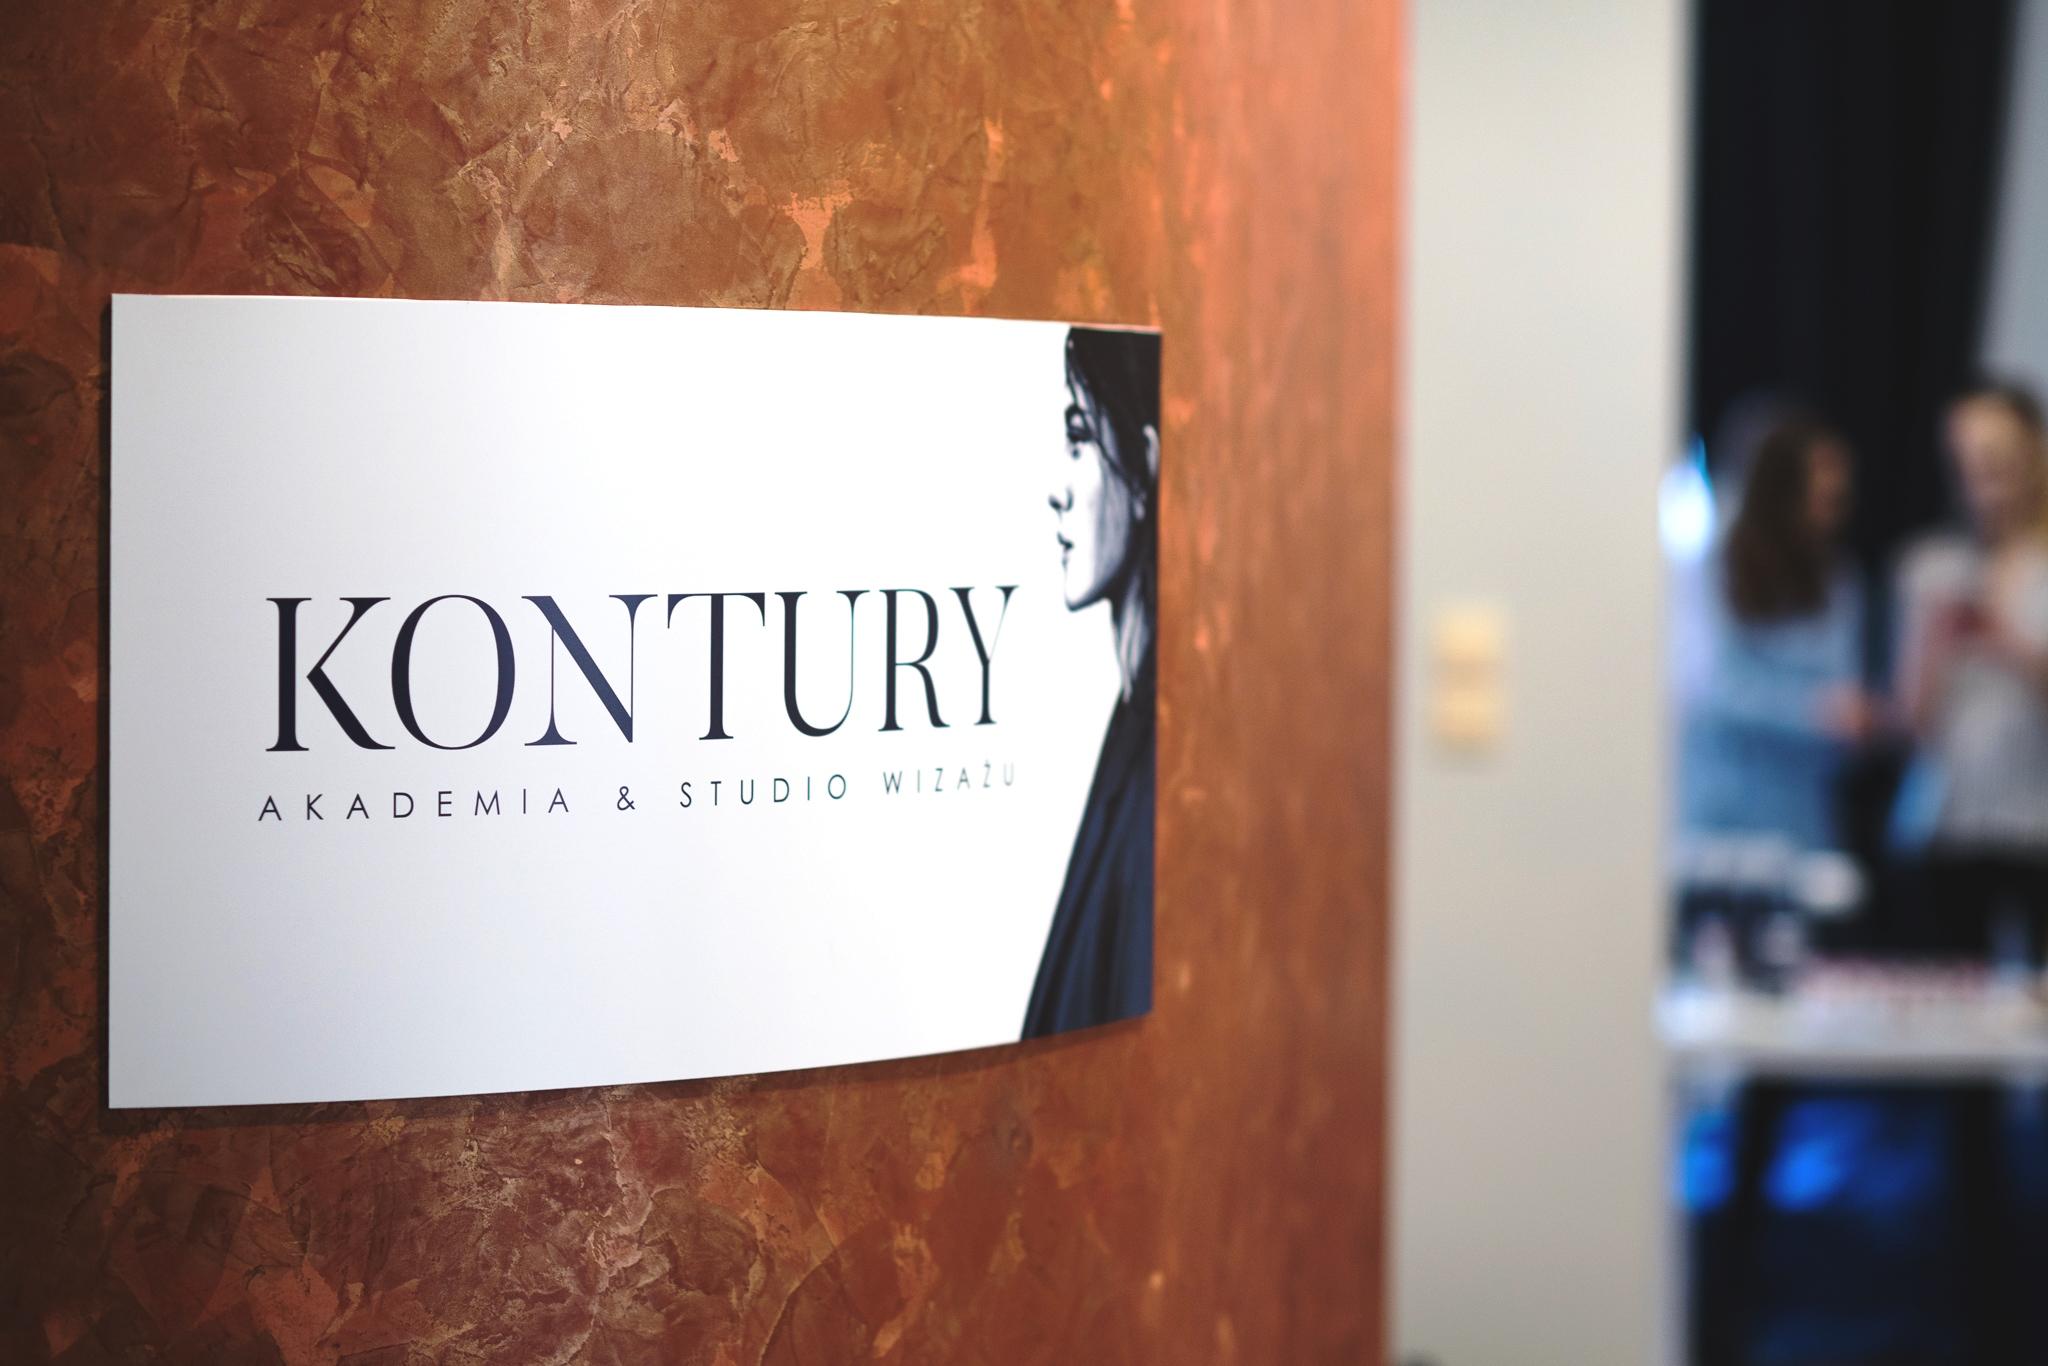 kontury-6